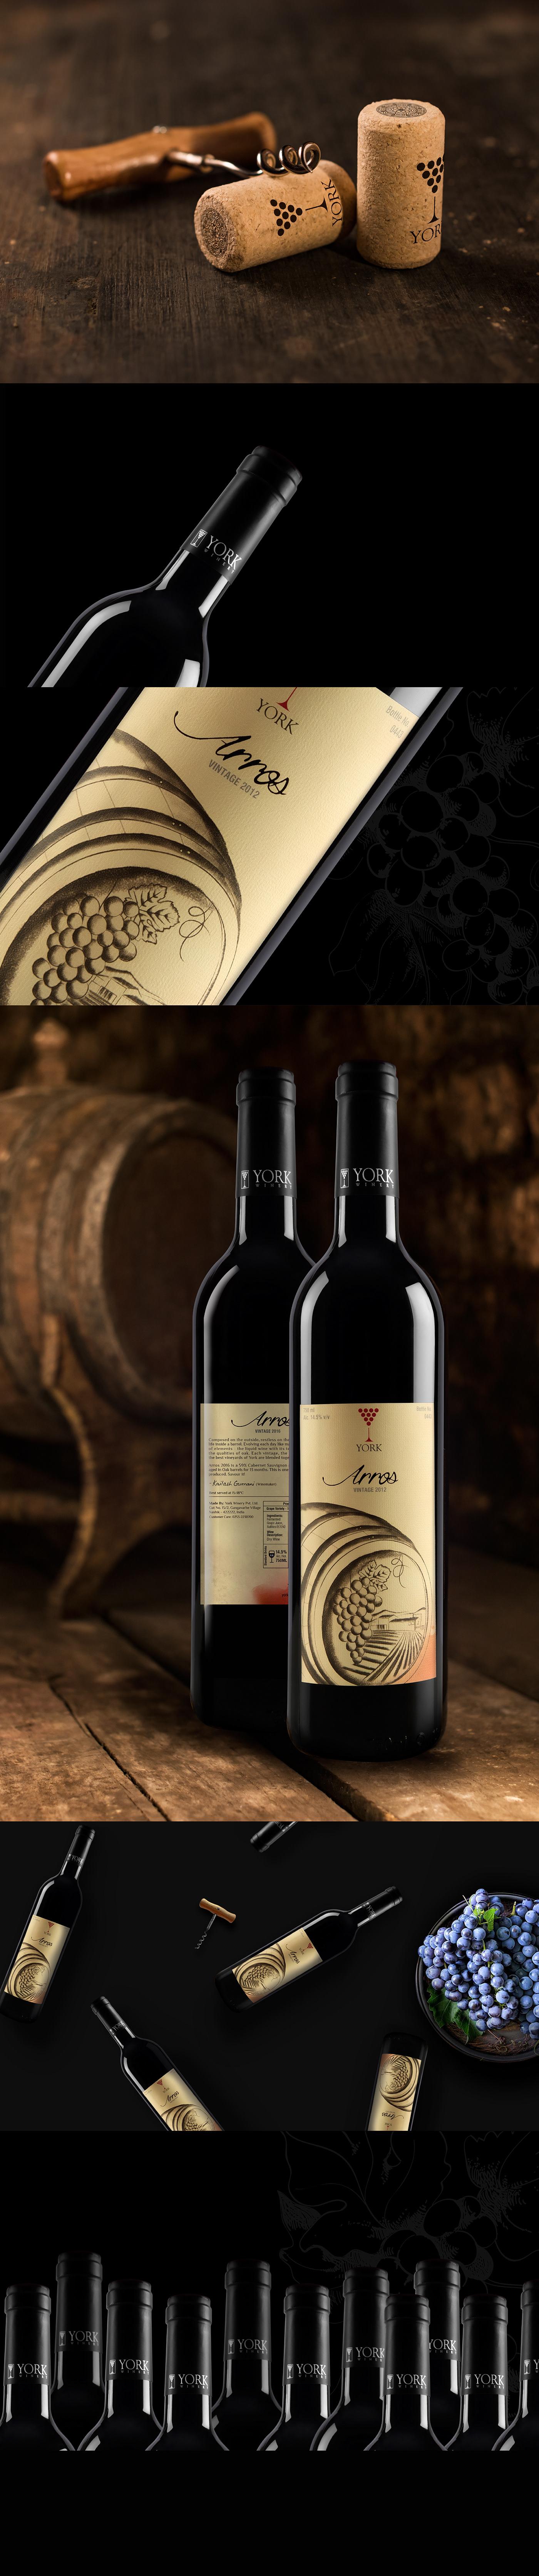 wine Wine label Design york winery Red wine premium wine label design Startup Farms